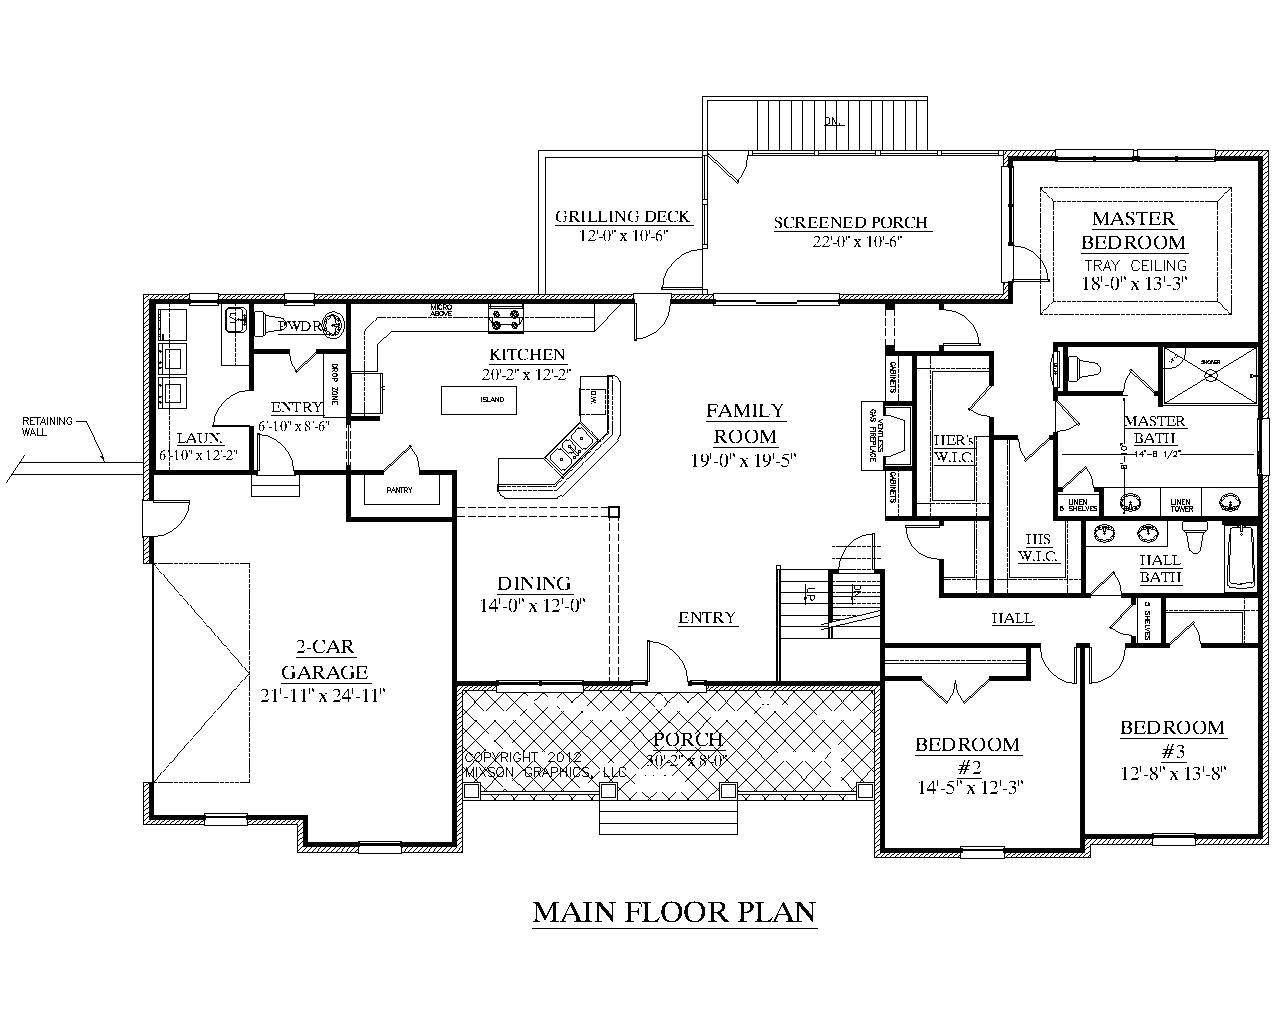 30000 sq ft house floor plan